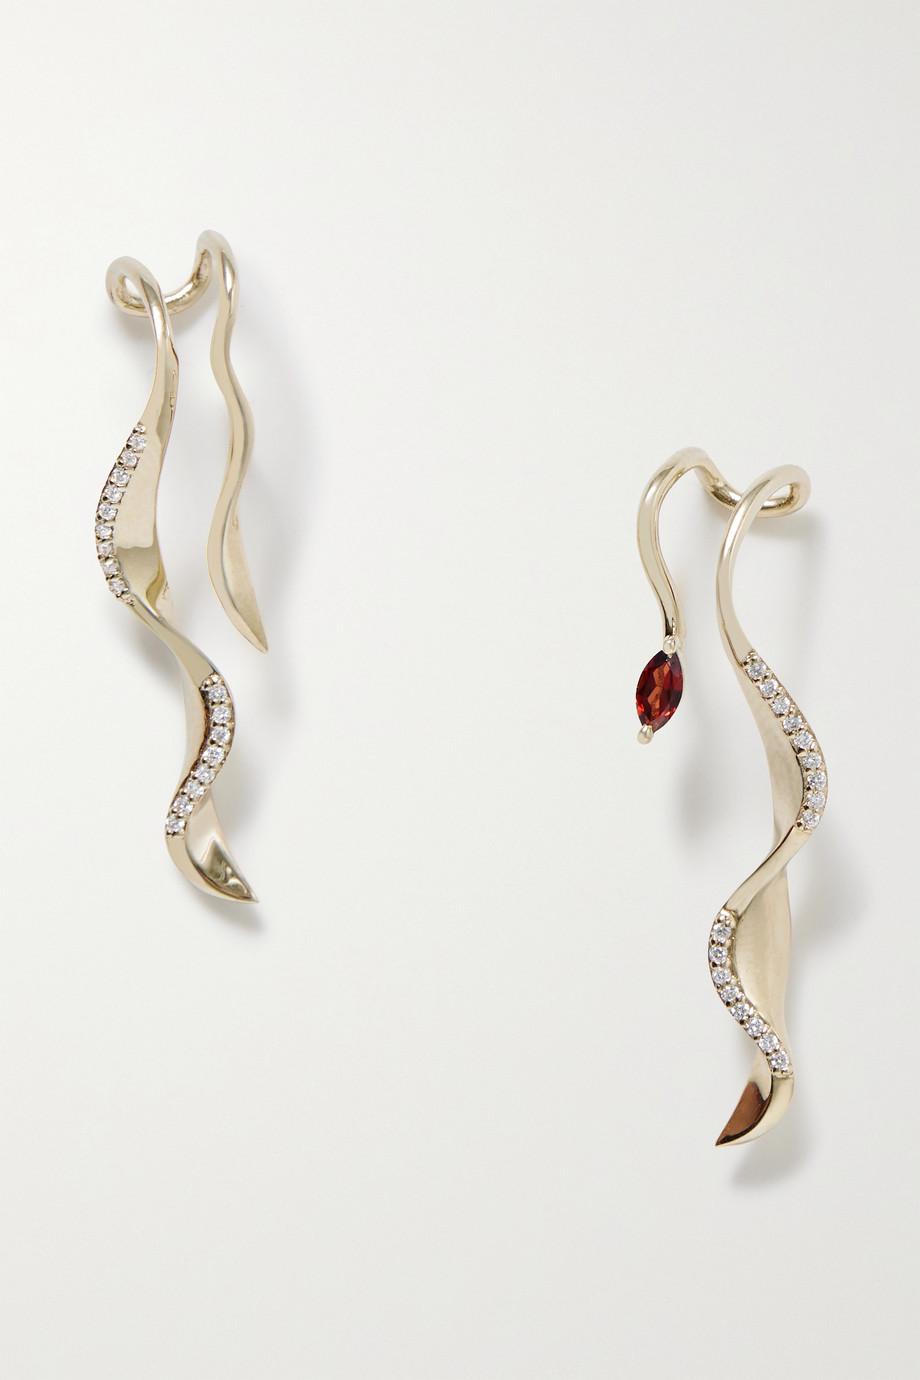 SARAH & SEBASTIAN Winedark Ohrringe aus recyceltem 10 Karat Gold mit Diamanten und Granat